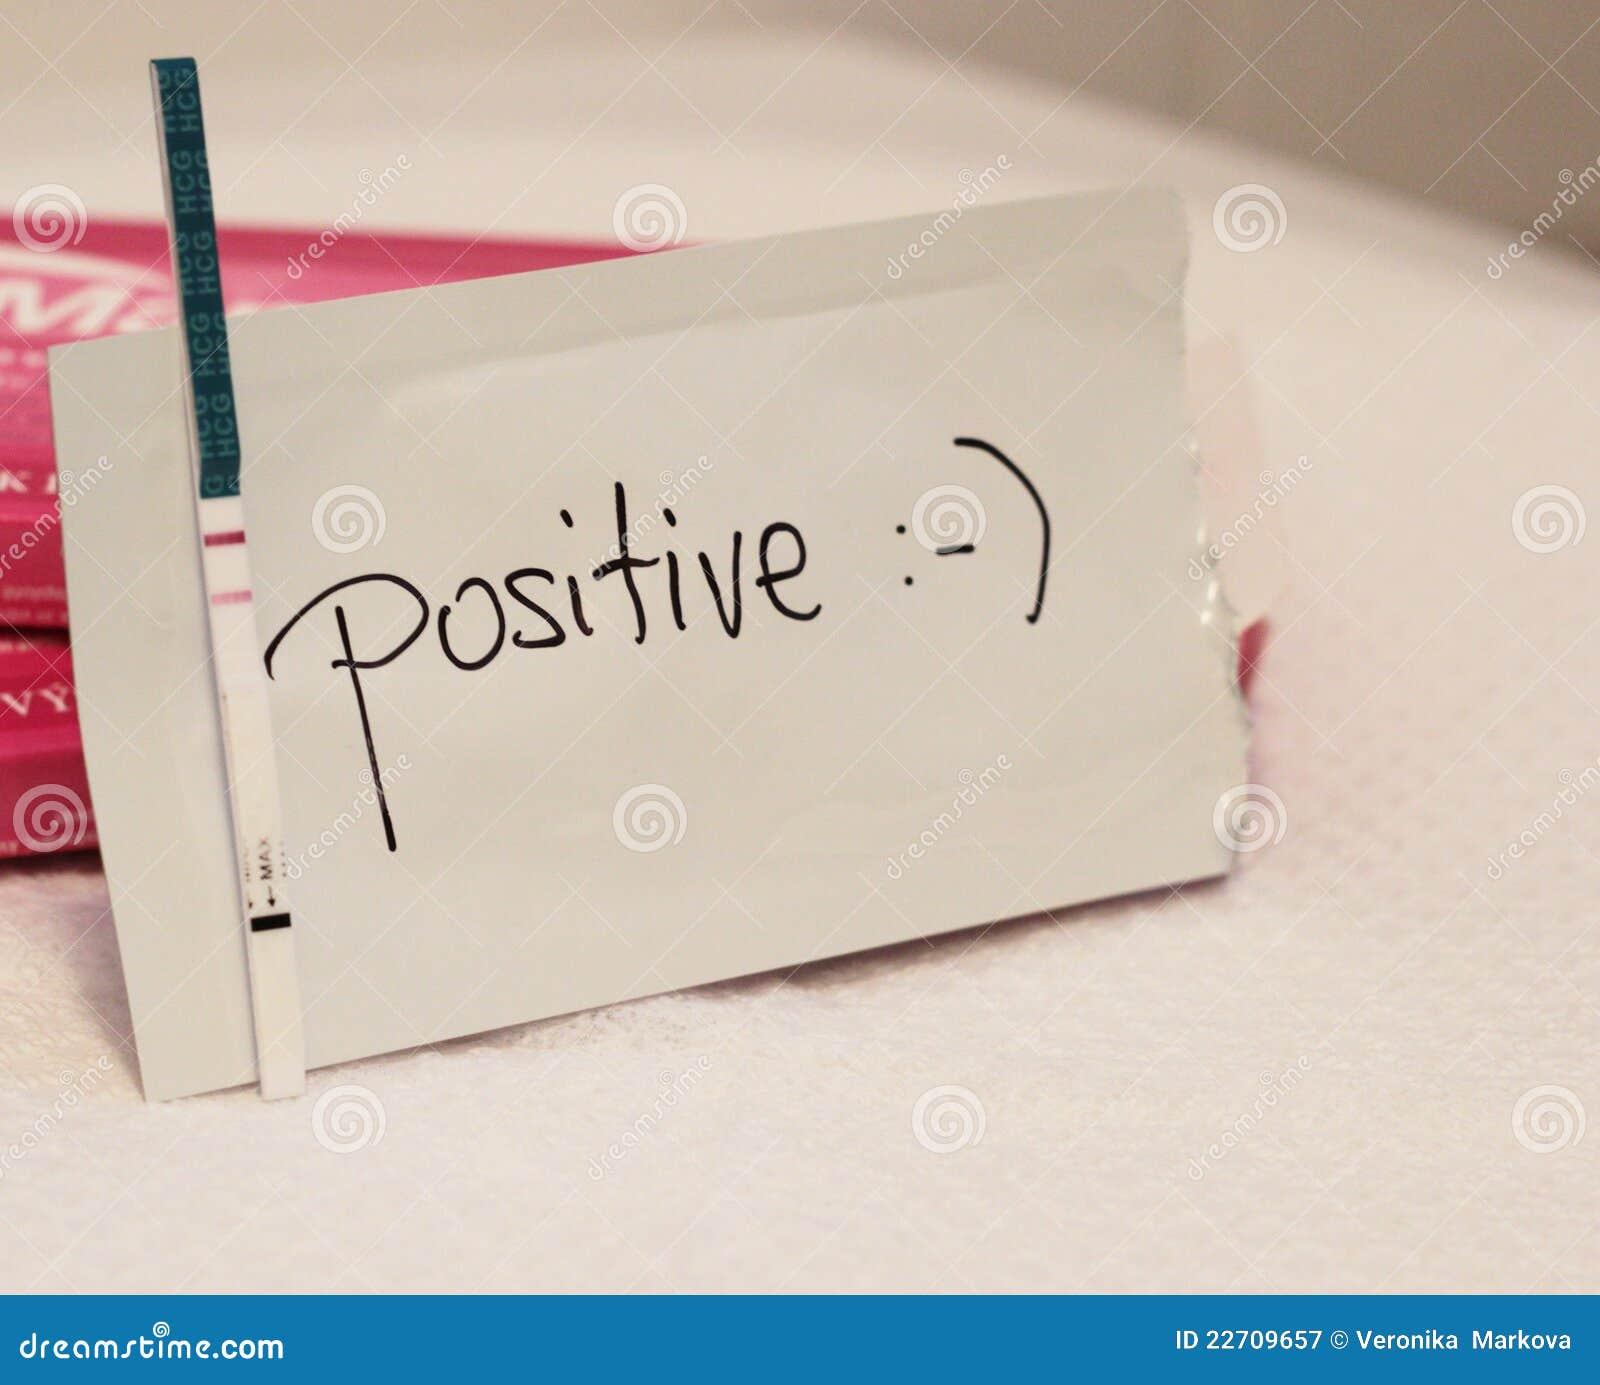 Positive pregnancy test stock image. Image of fertility ...